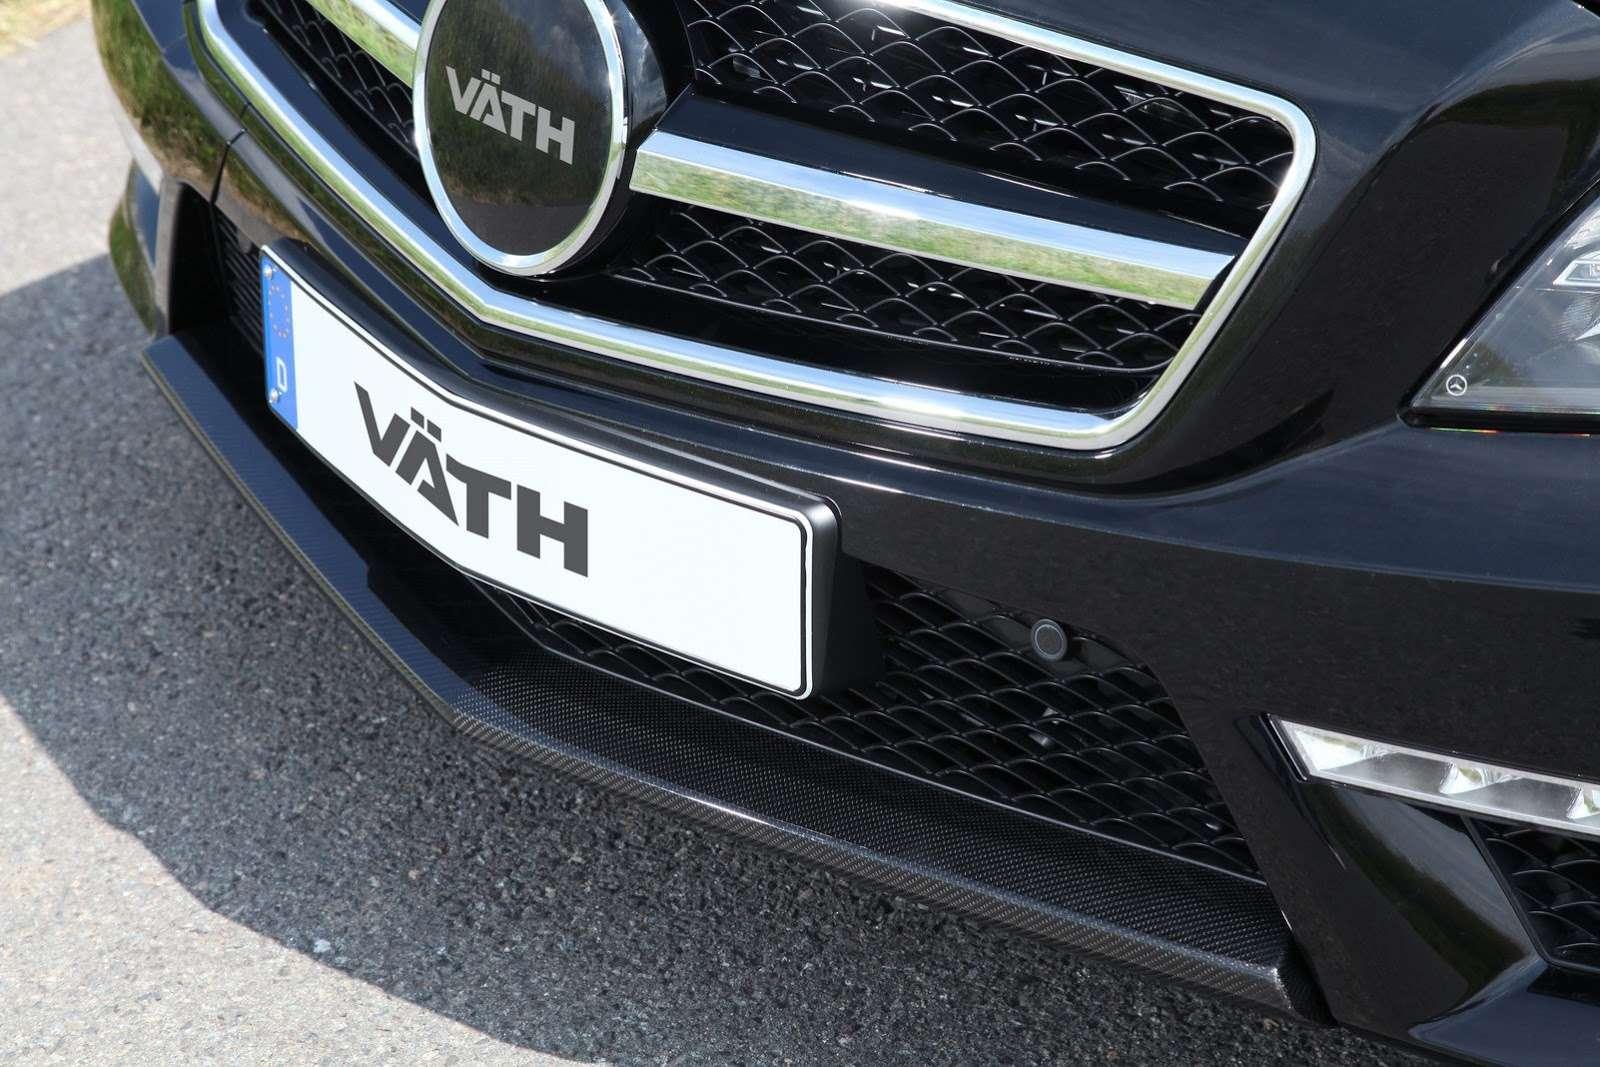 Mercedes CLS 63 AMG Shooting Brake Vath